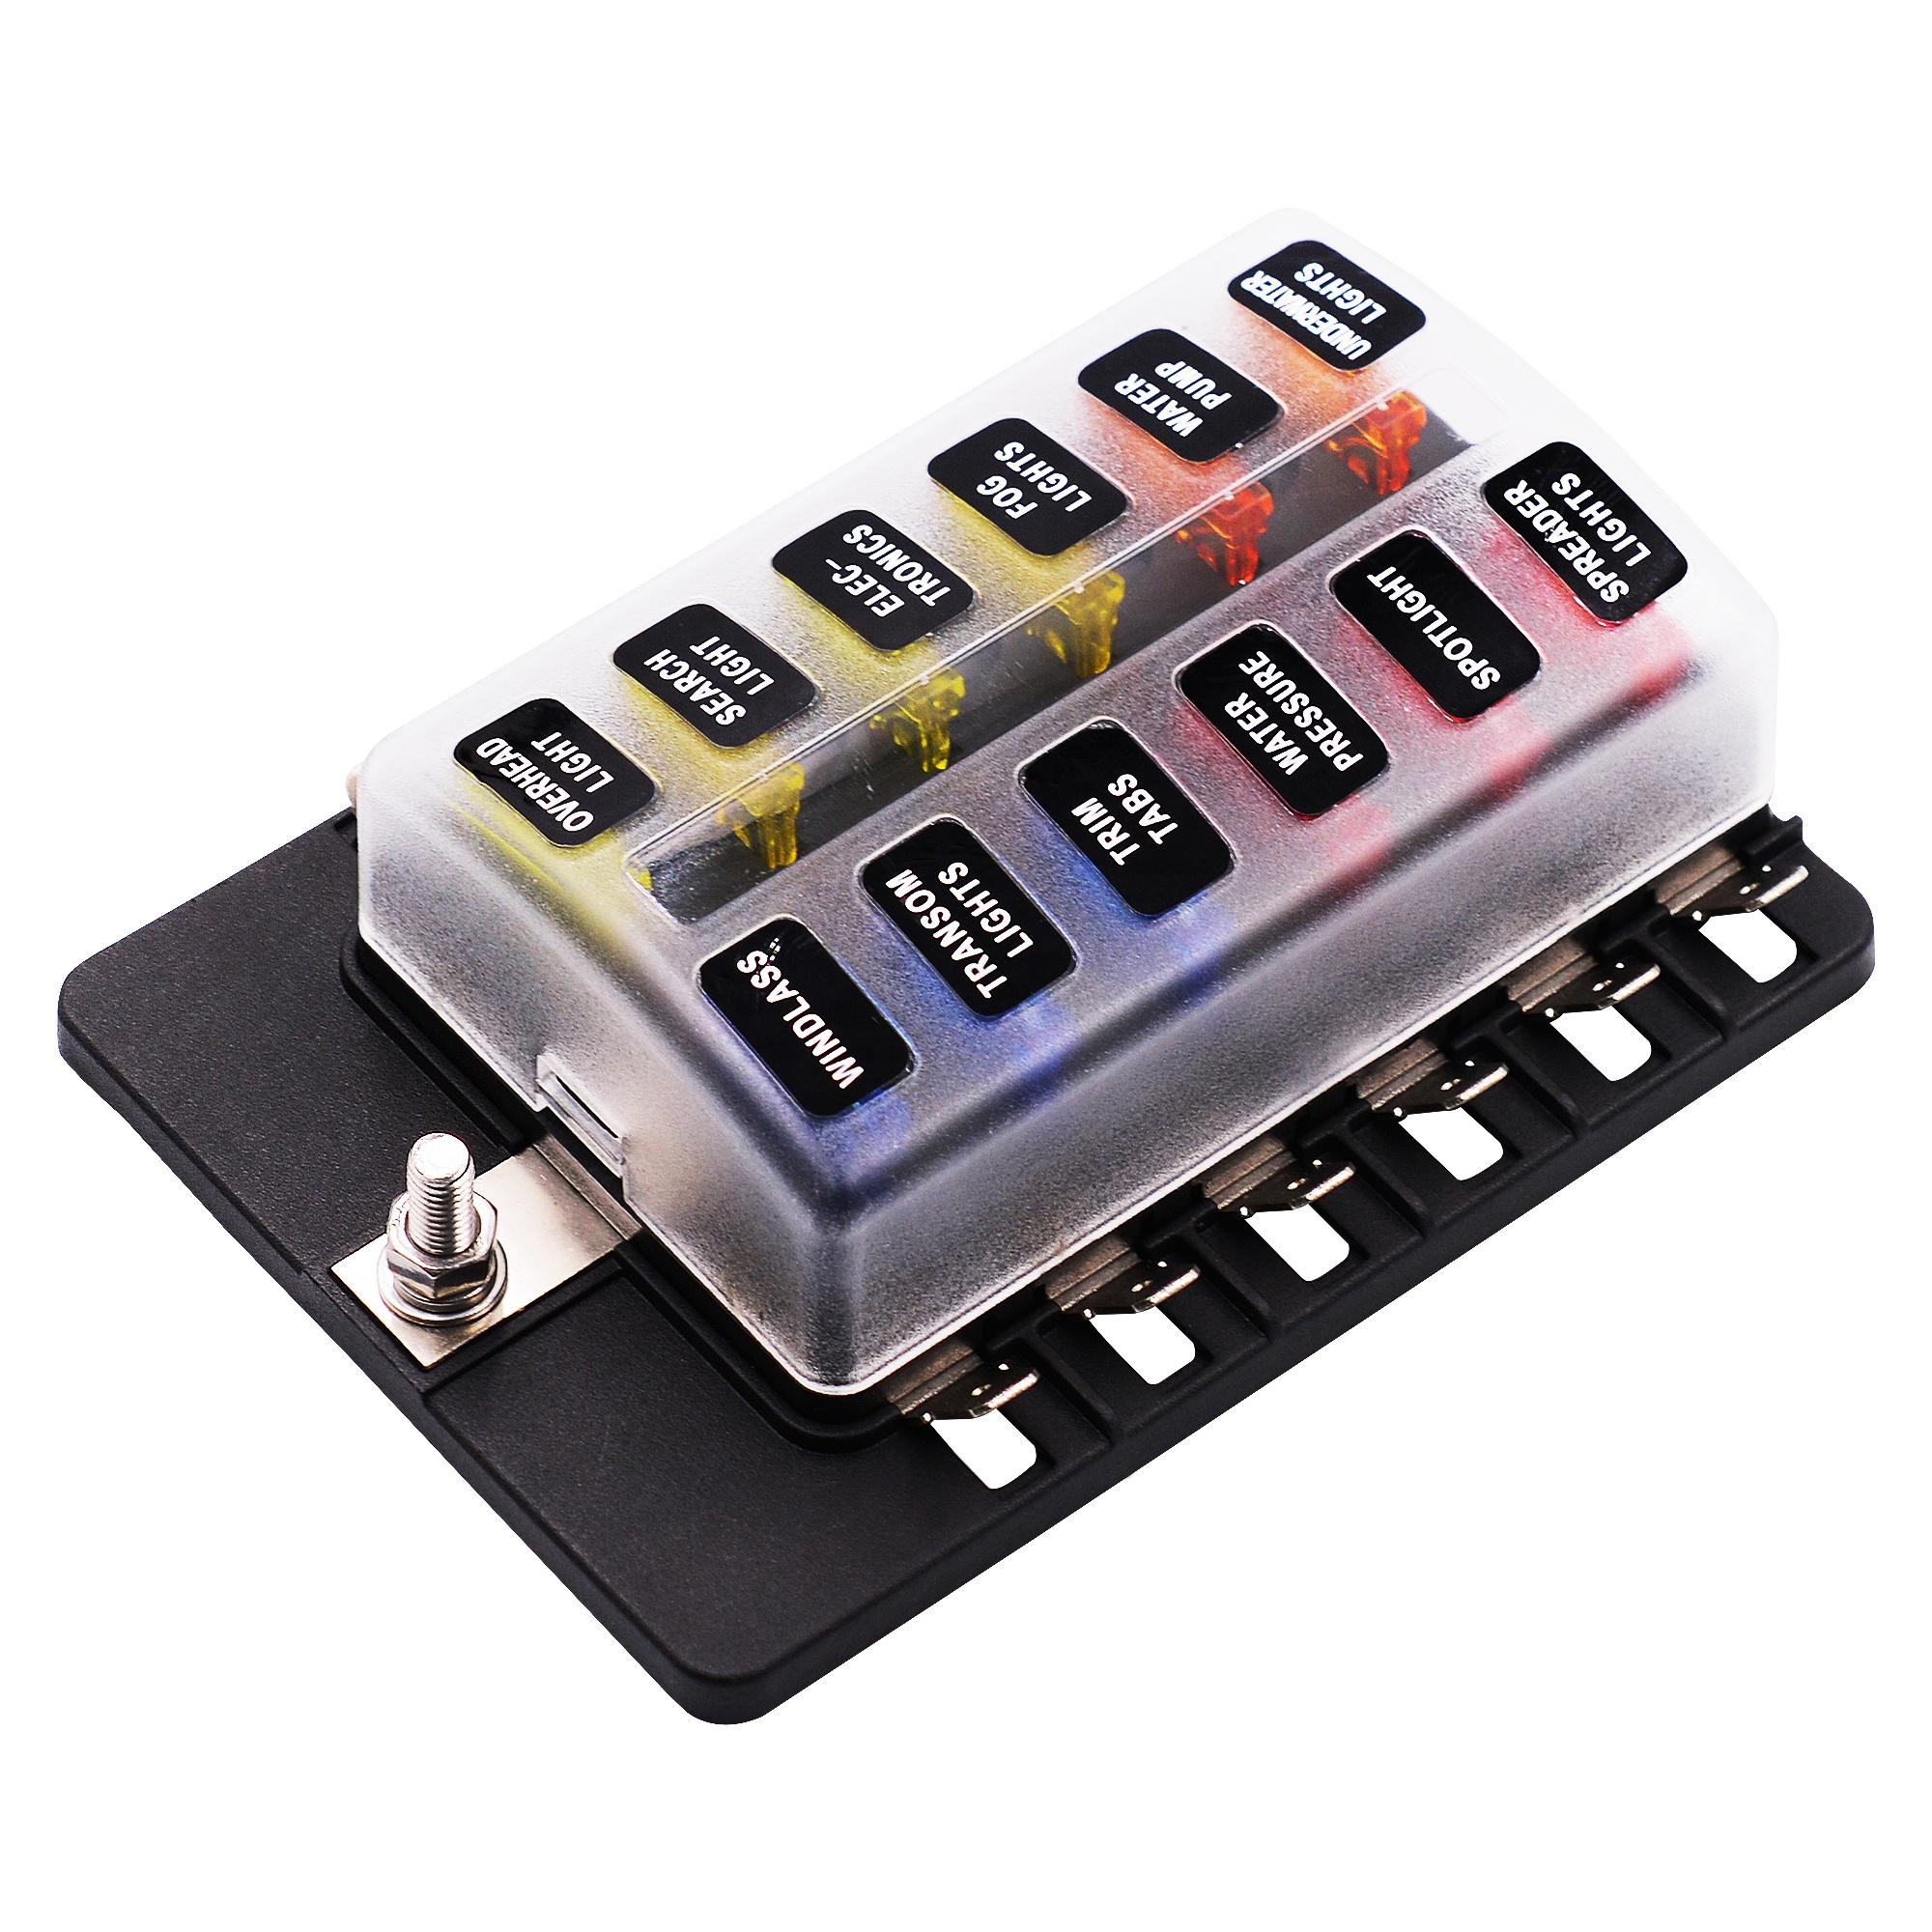 low voltage dc dustproof automotive filter car fuse box block holder with  indicator light - buy 24v fuse box,12v fuse box,fuse box product on  alibaba.com  alibaba.com